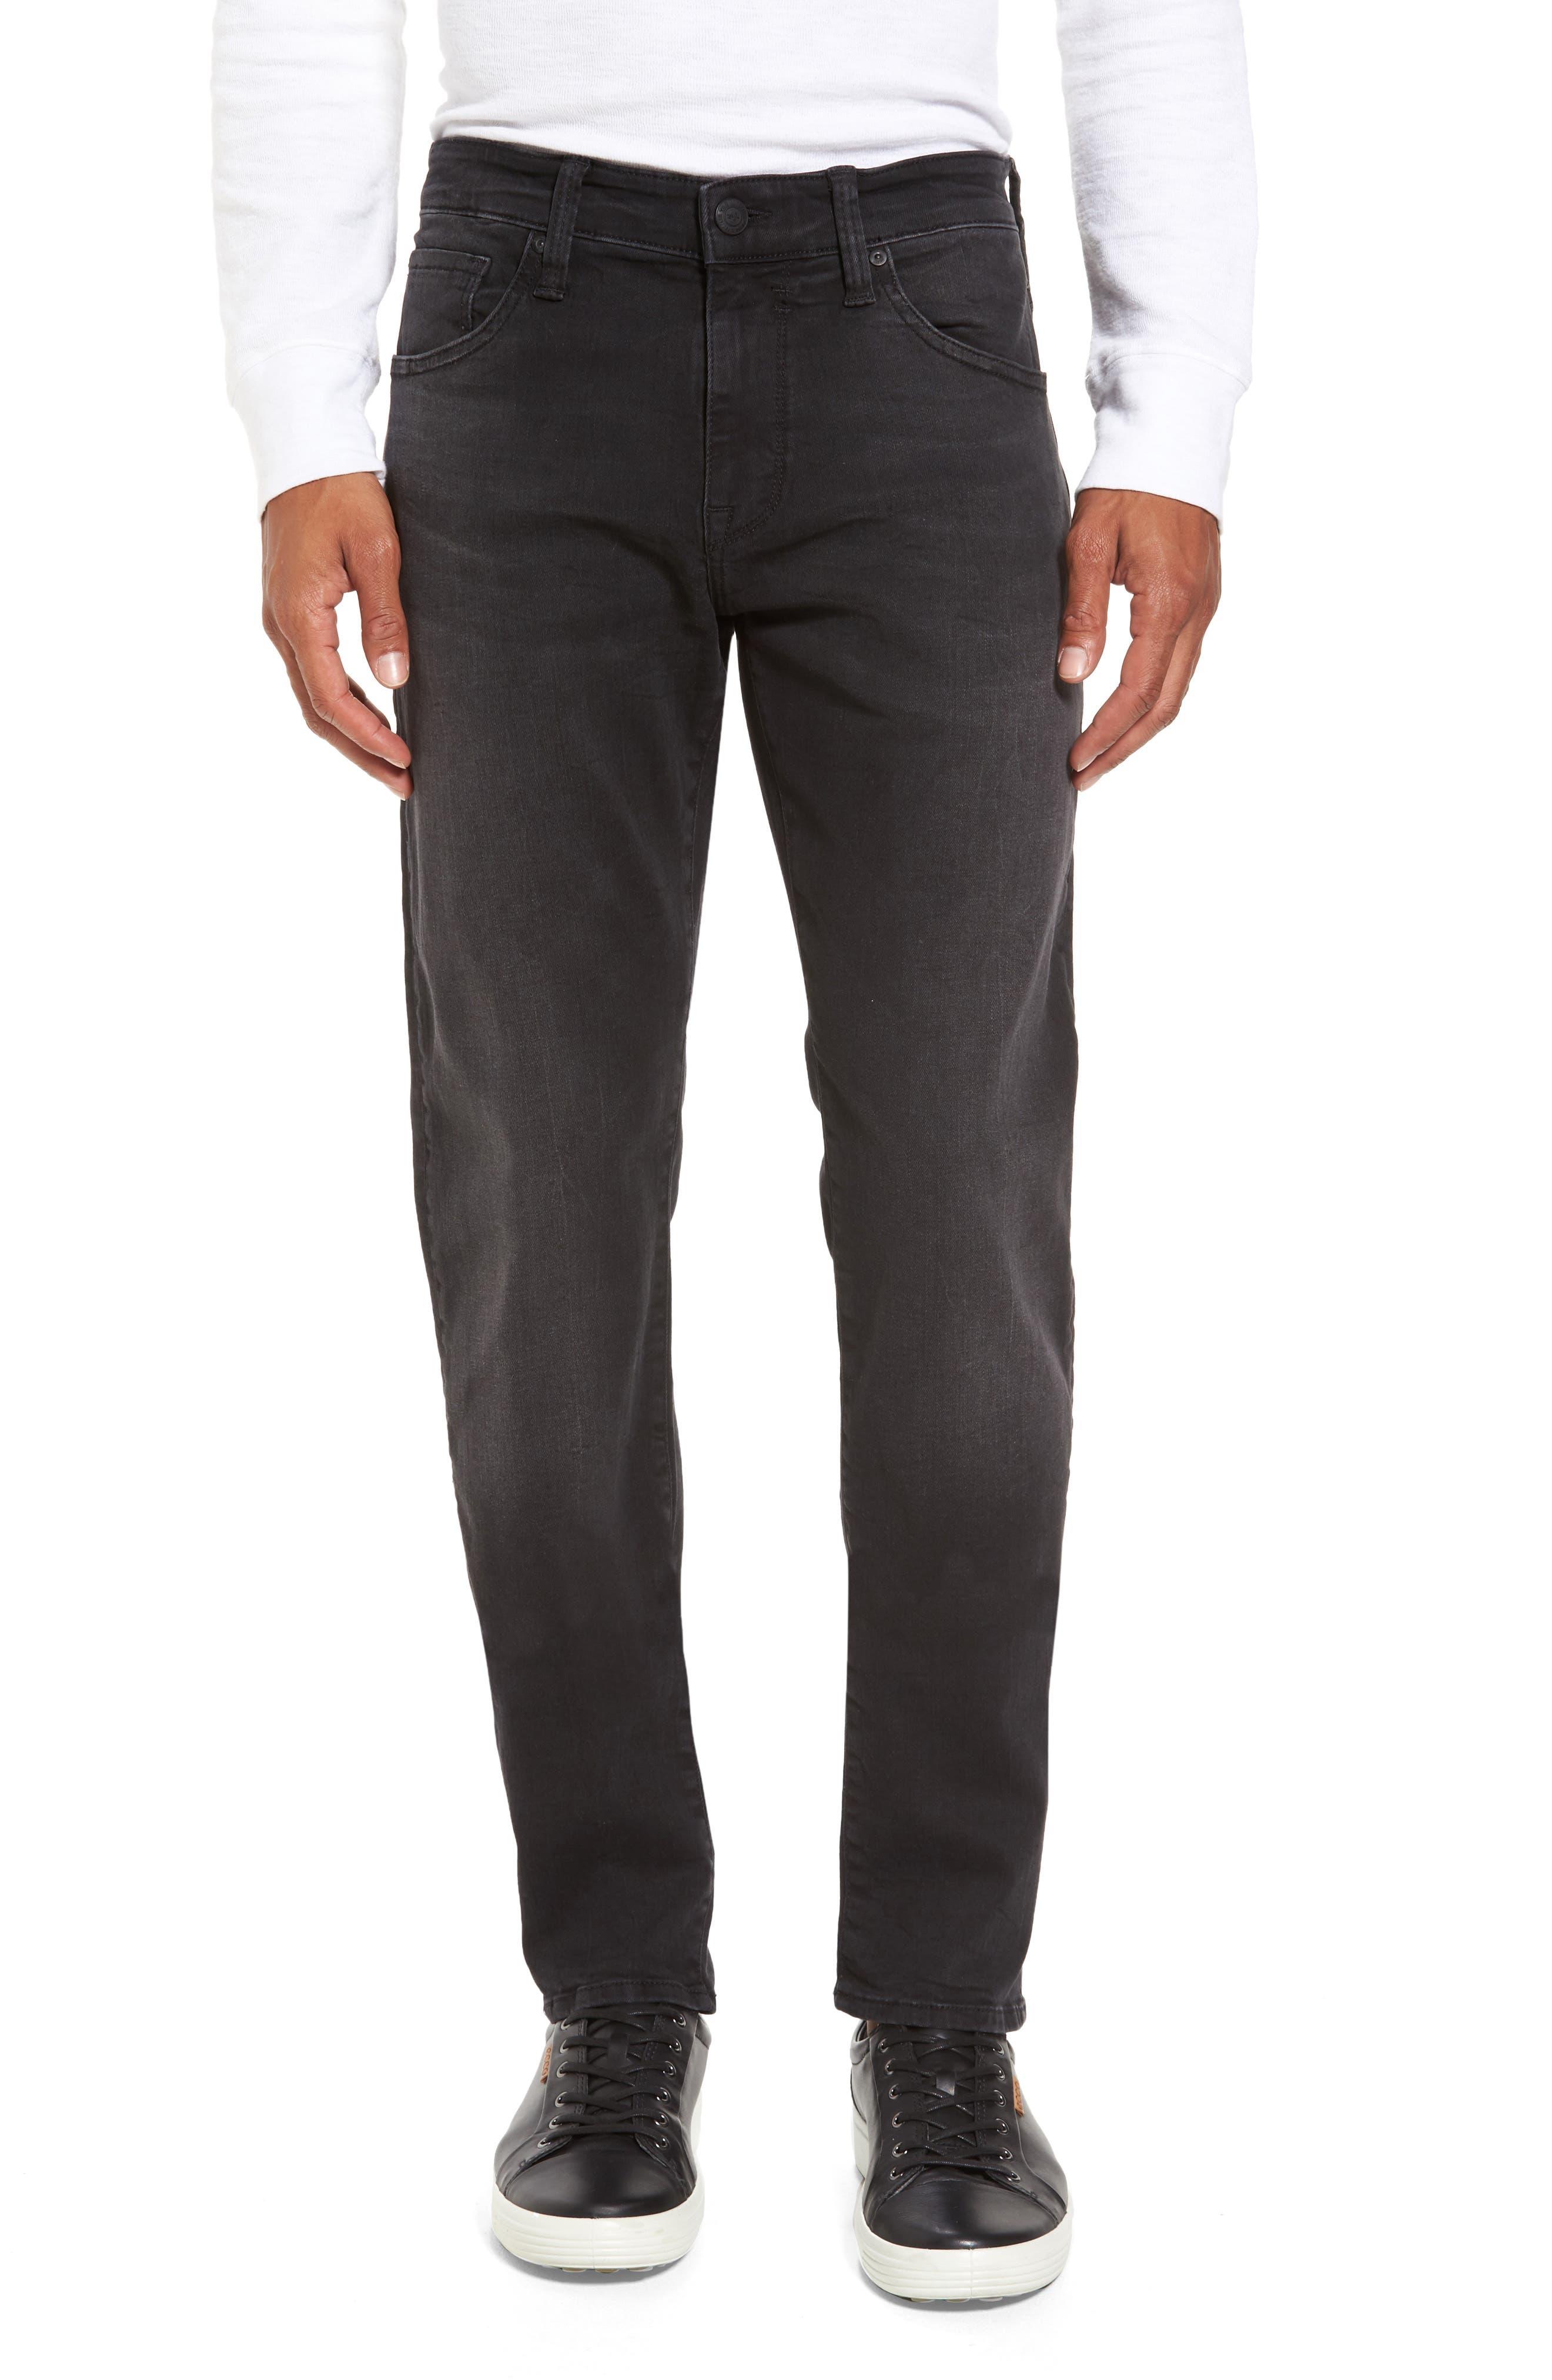 Jake Slim Fit Jeans,                         Main,                         color, 020